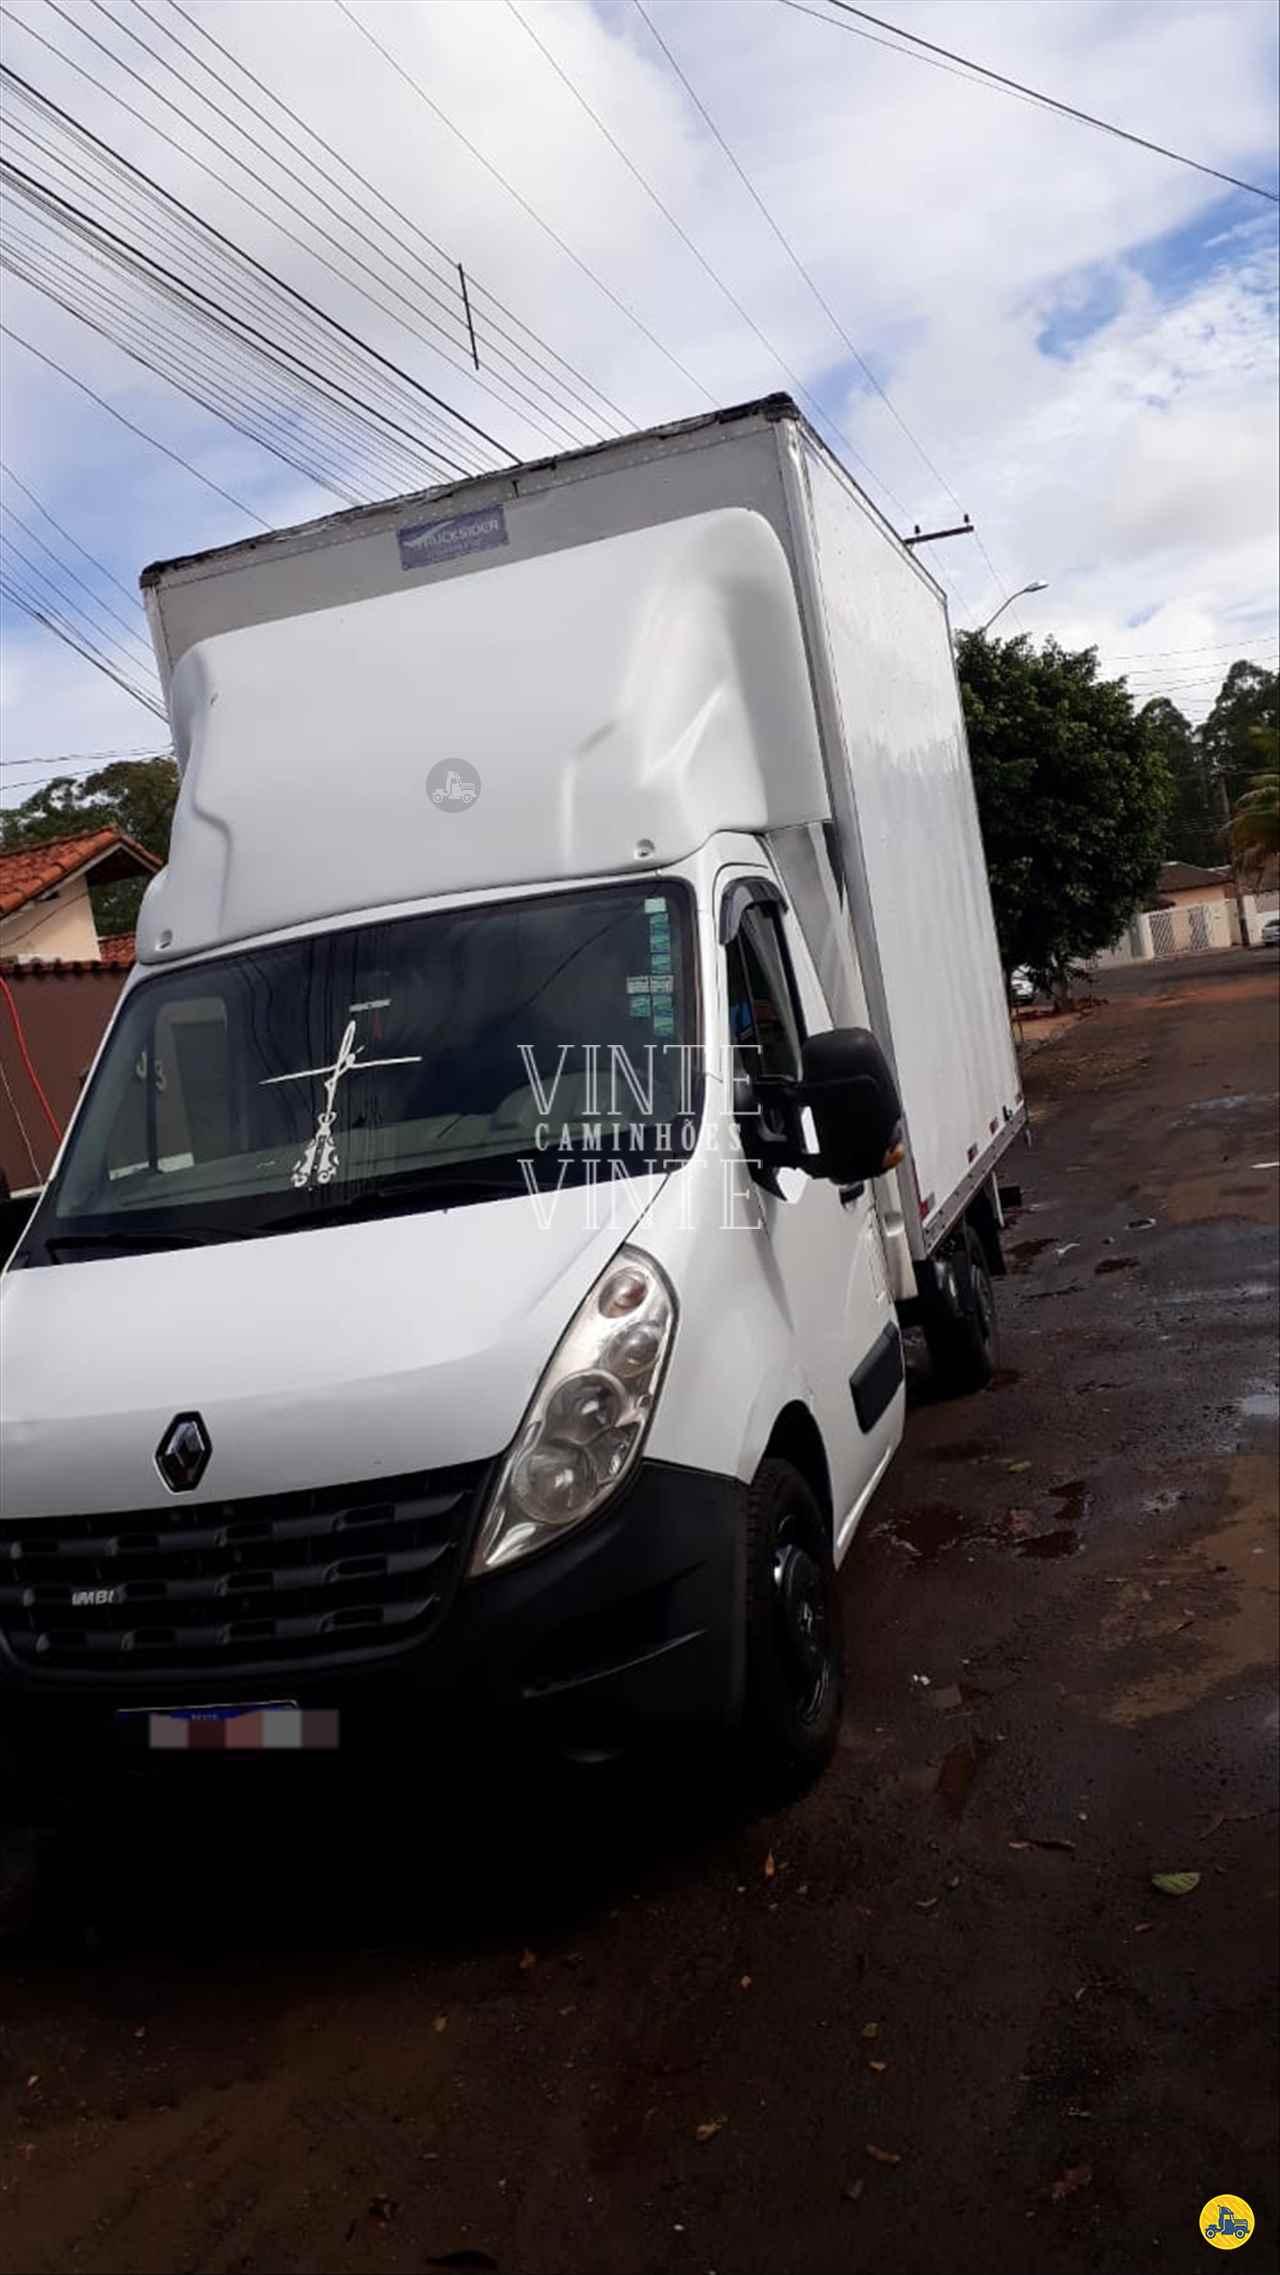 UTILITARIOS RENAULT Master Chassi Cabine 2.3 Vinte-Vinte Caminhões SANTO ANDRE SÃO PAULO SP